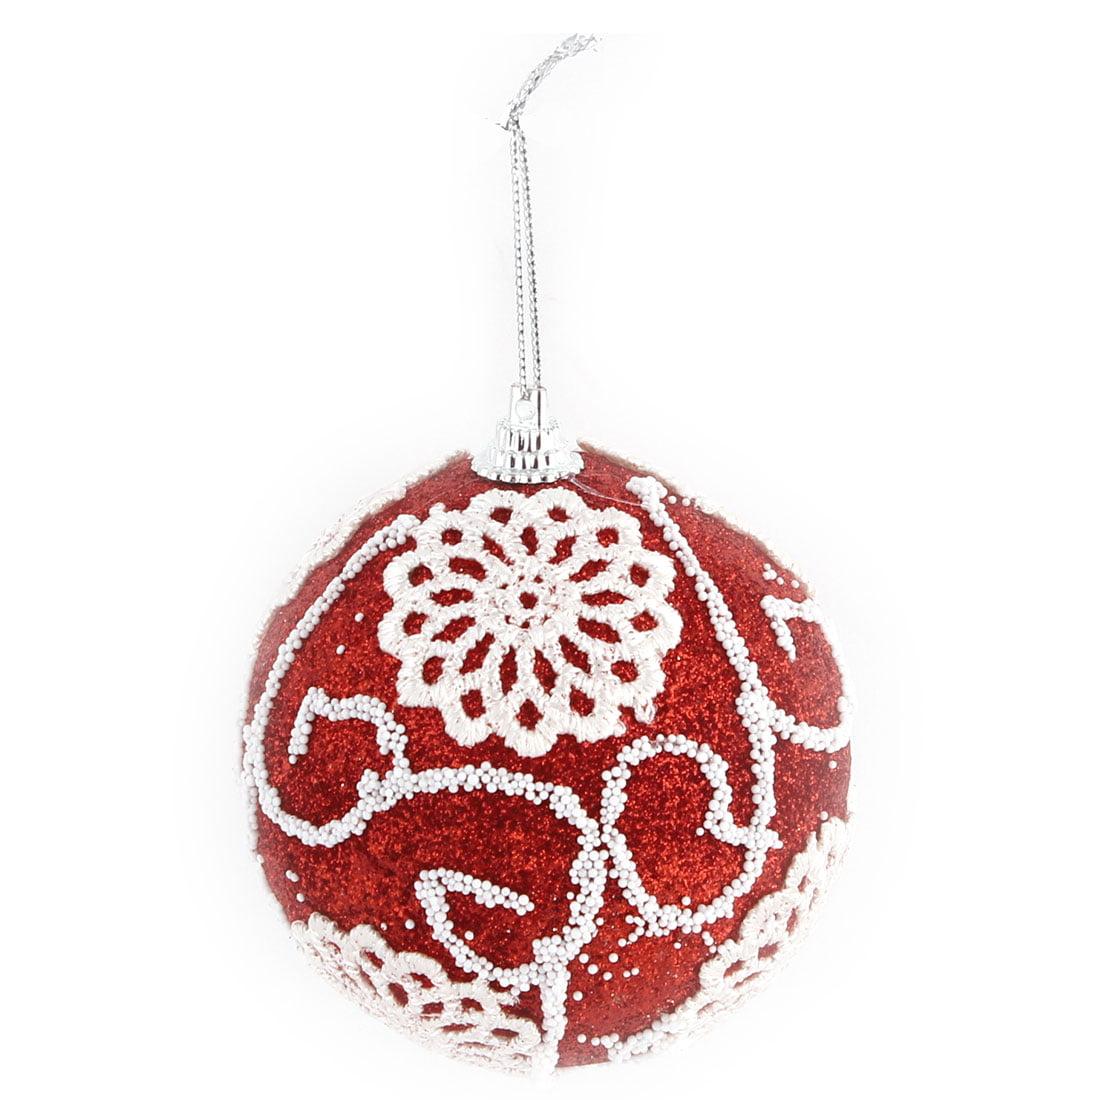 Unique Bargains Home Christmas Tree Applique Decor Artificial Collectible Crafts Hanging Ball